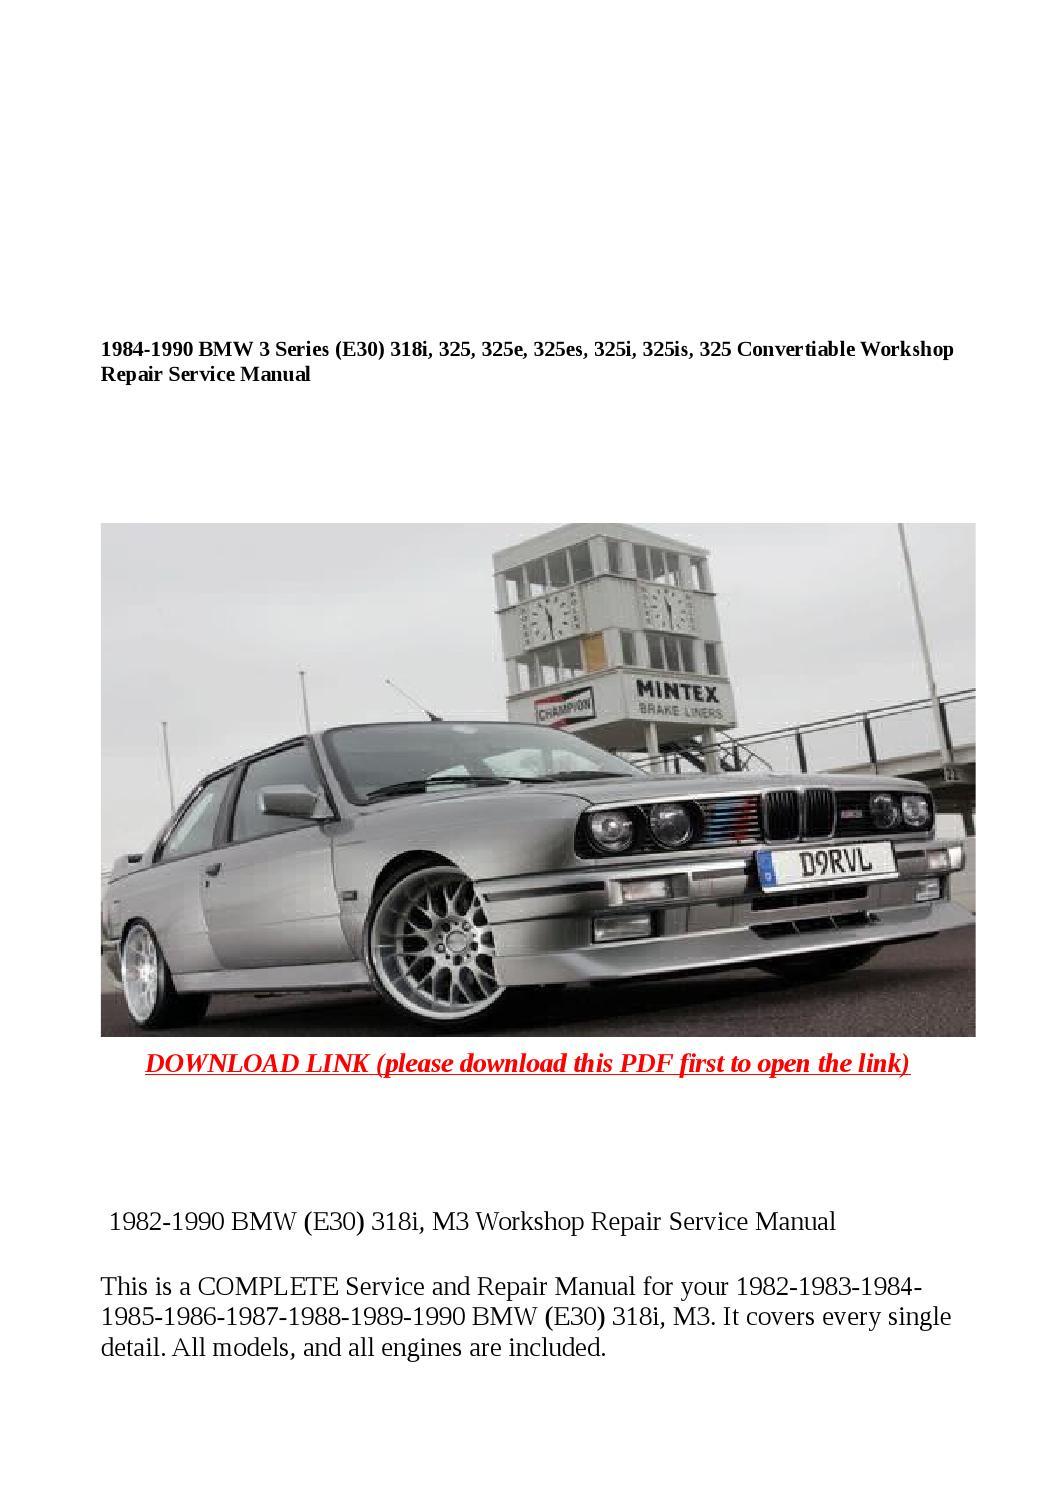 1982 1990 Bmw  E30  318i  M3 Workshop Repair Service